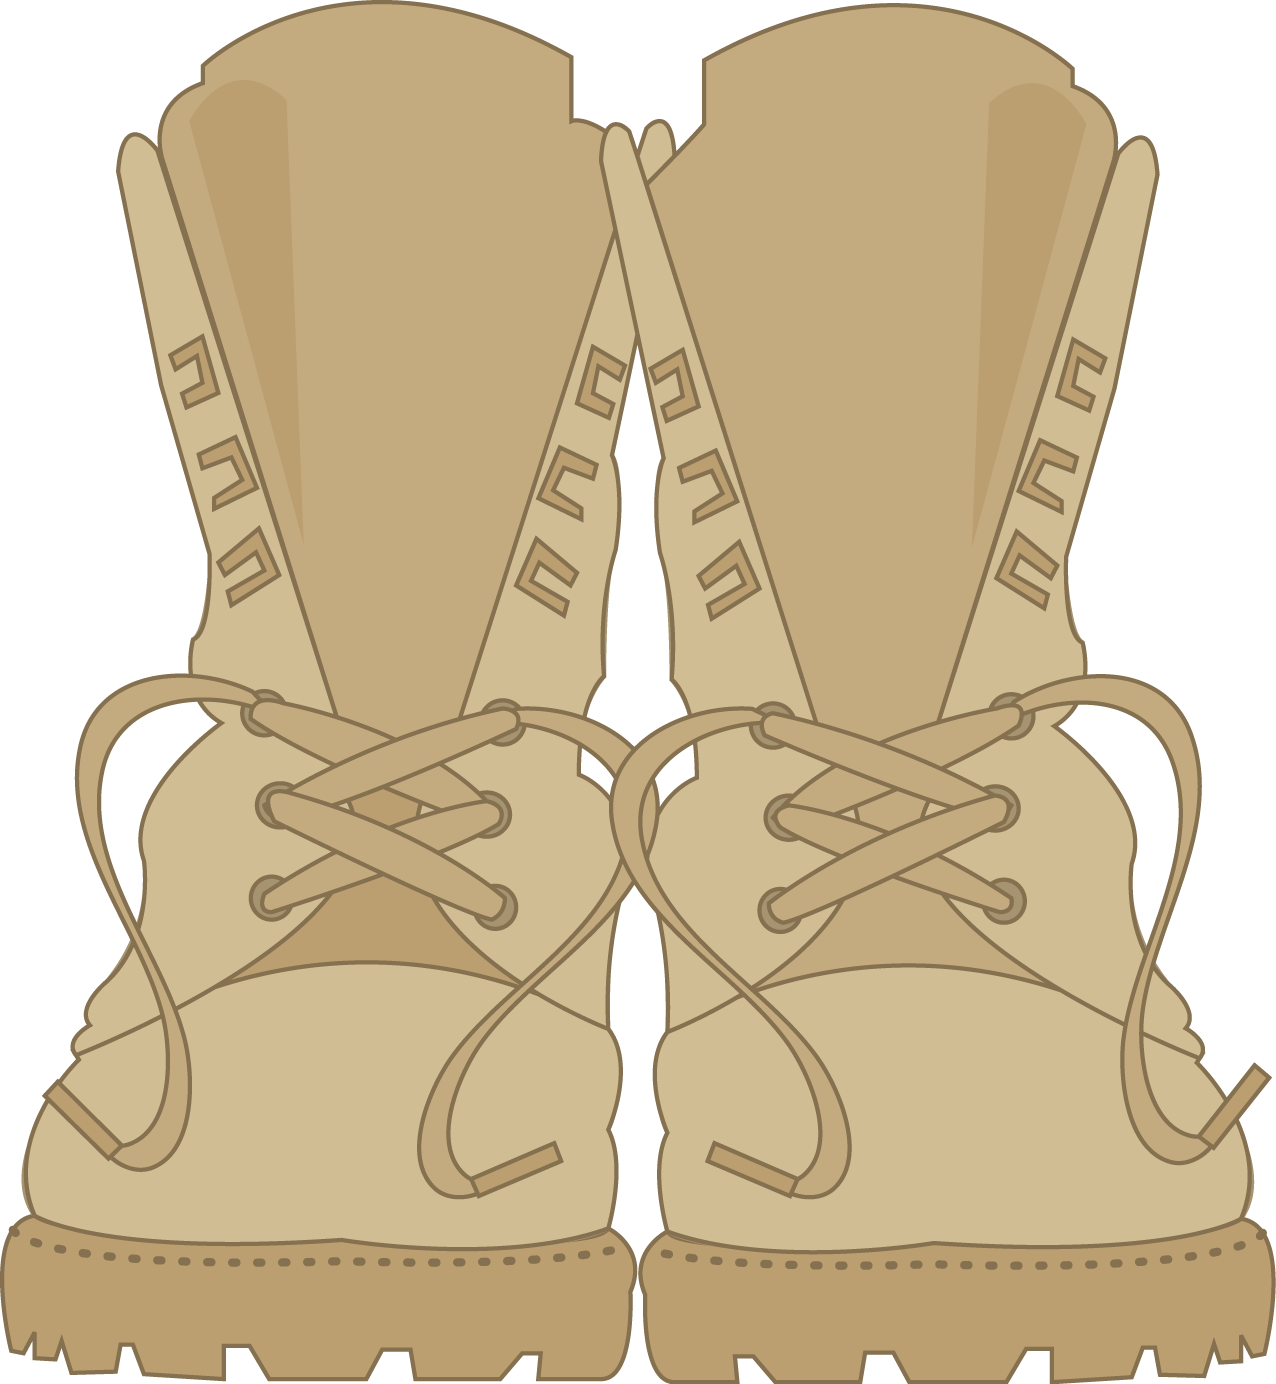 Photo by daniellemoraesfalcao minus. Hike clipart brown boot